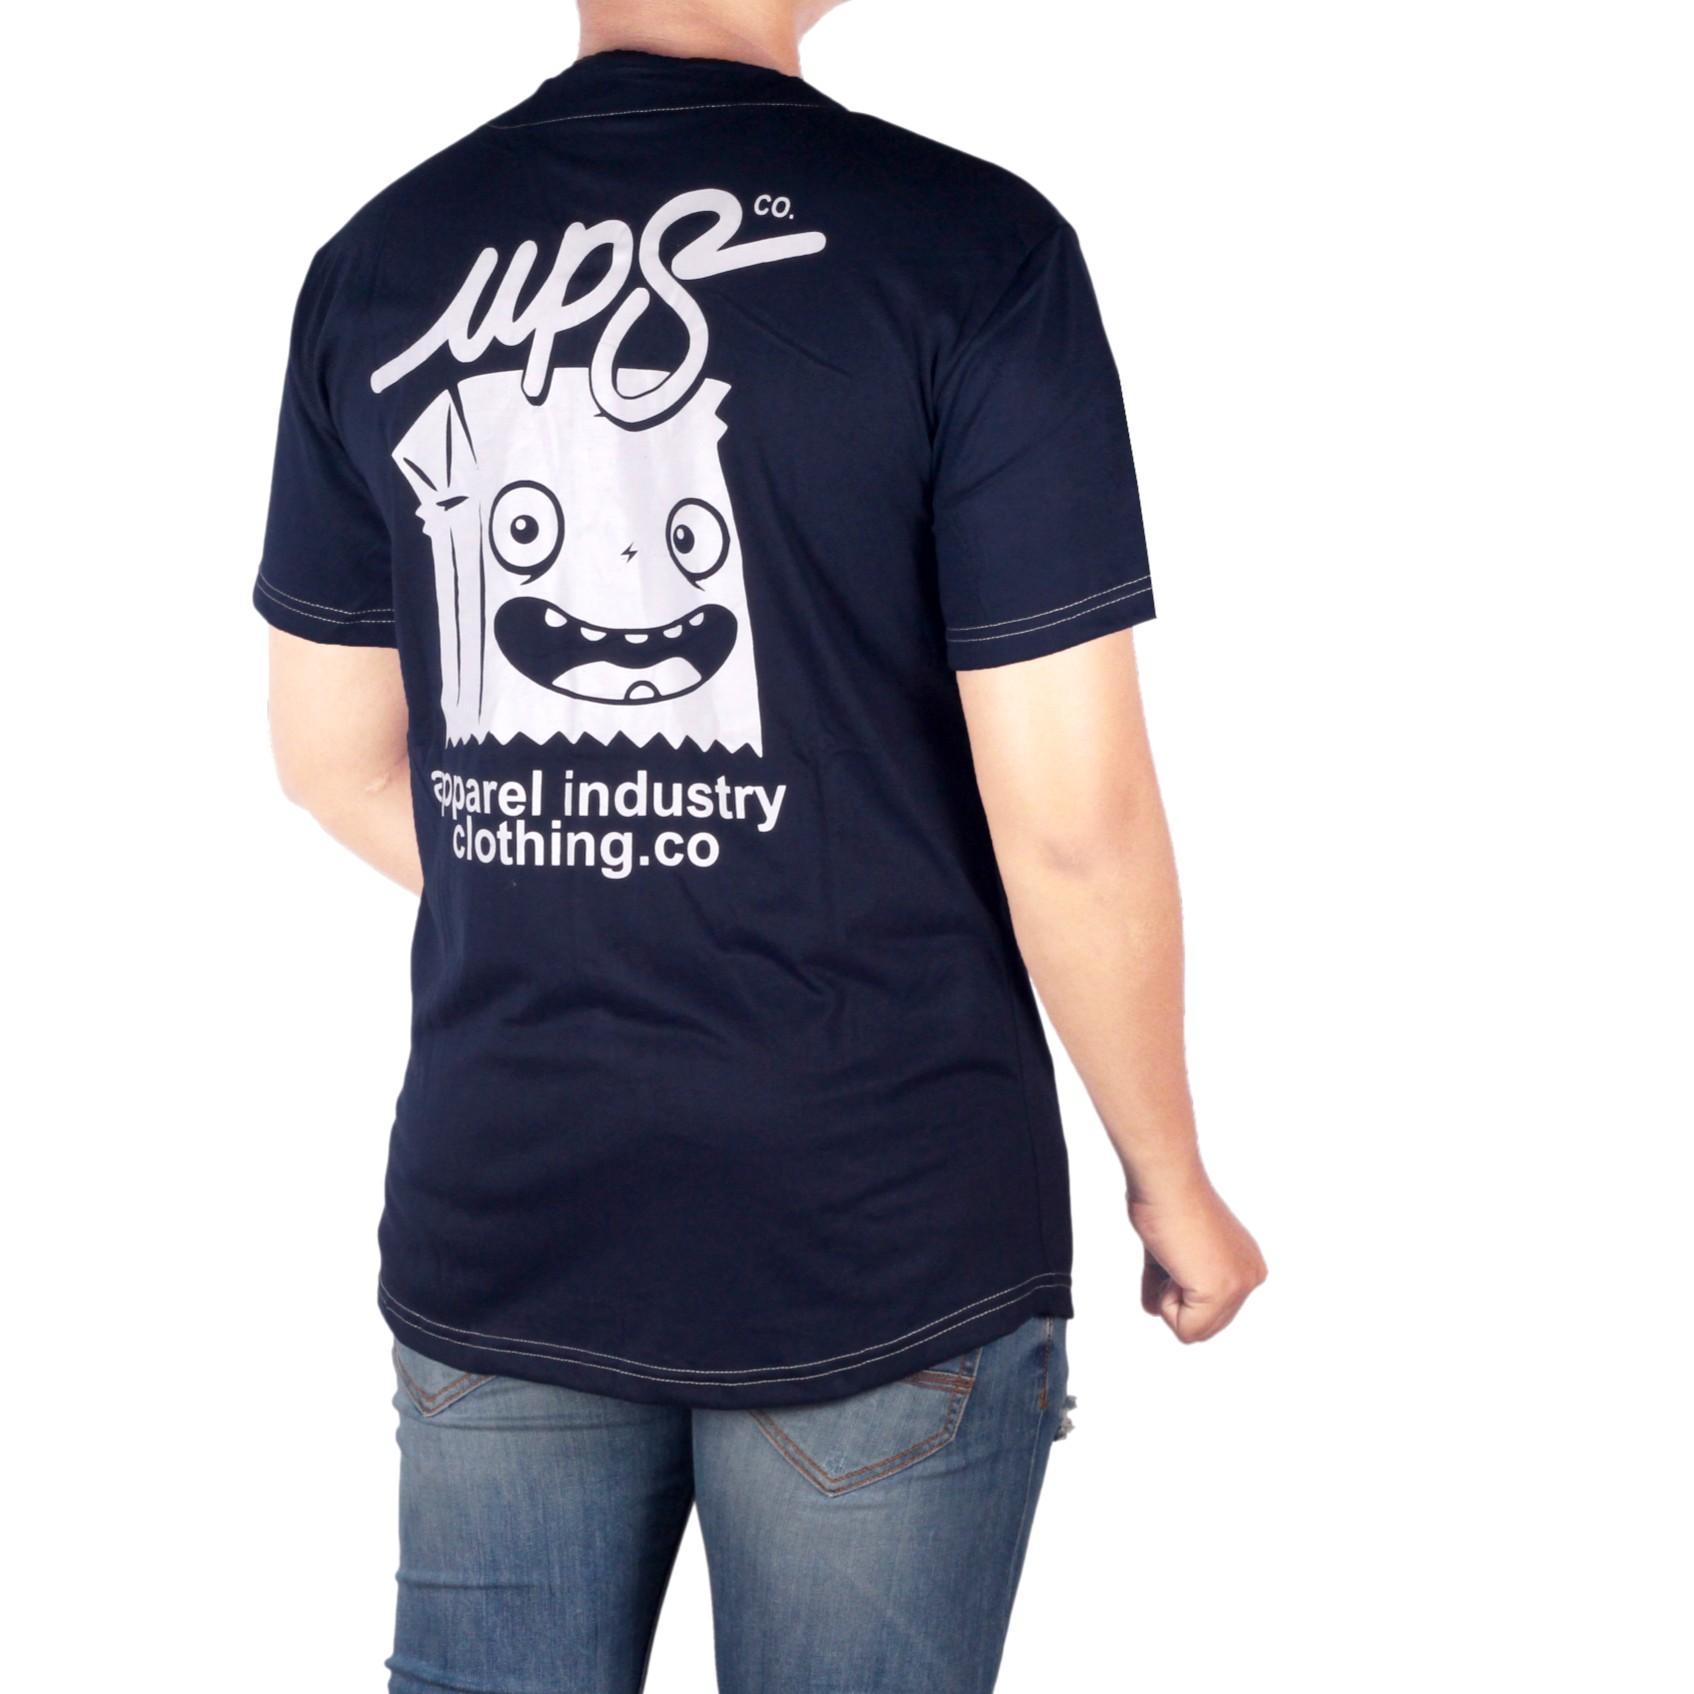 Dgm_Fashion1 baju kaos Distro Polos Navy BASEBALL Premium/ Baju Kaos Distro Baseball Hitam dan Putih/Kaos DIstro/Kaos Pria/Kaos Oblong/Kaos Men/Kaos Young Lex/Kaos YOGS/Kaos Swag/Kaos Murah/Kaos COMBED/Baju Distro NS 5706